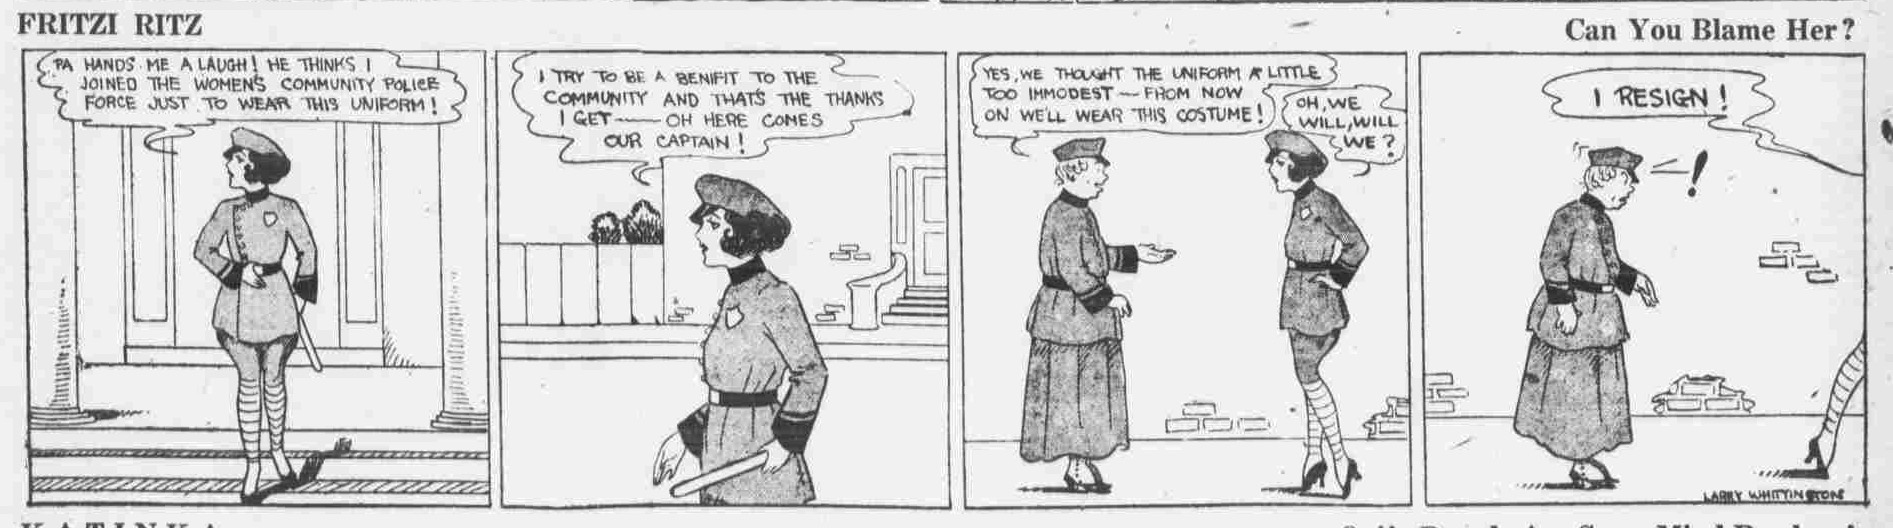 Nov. 18, 1922